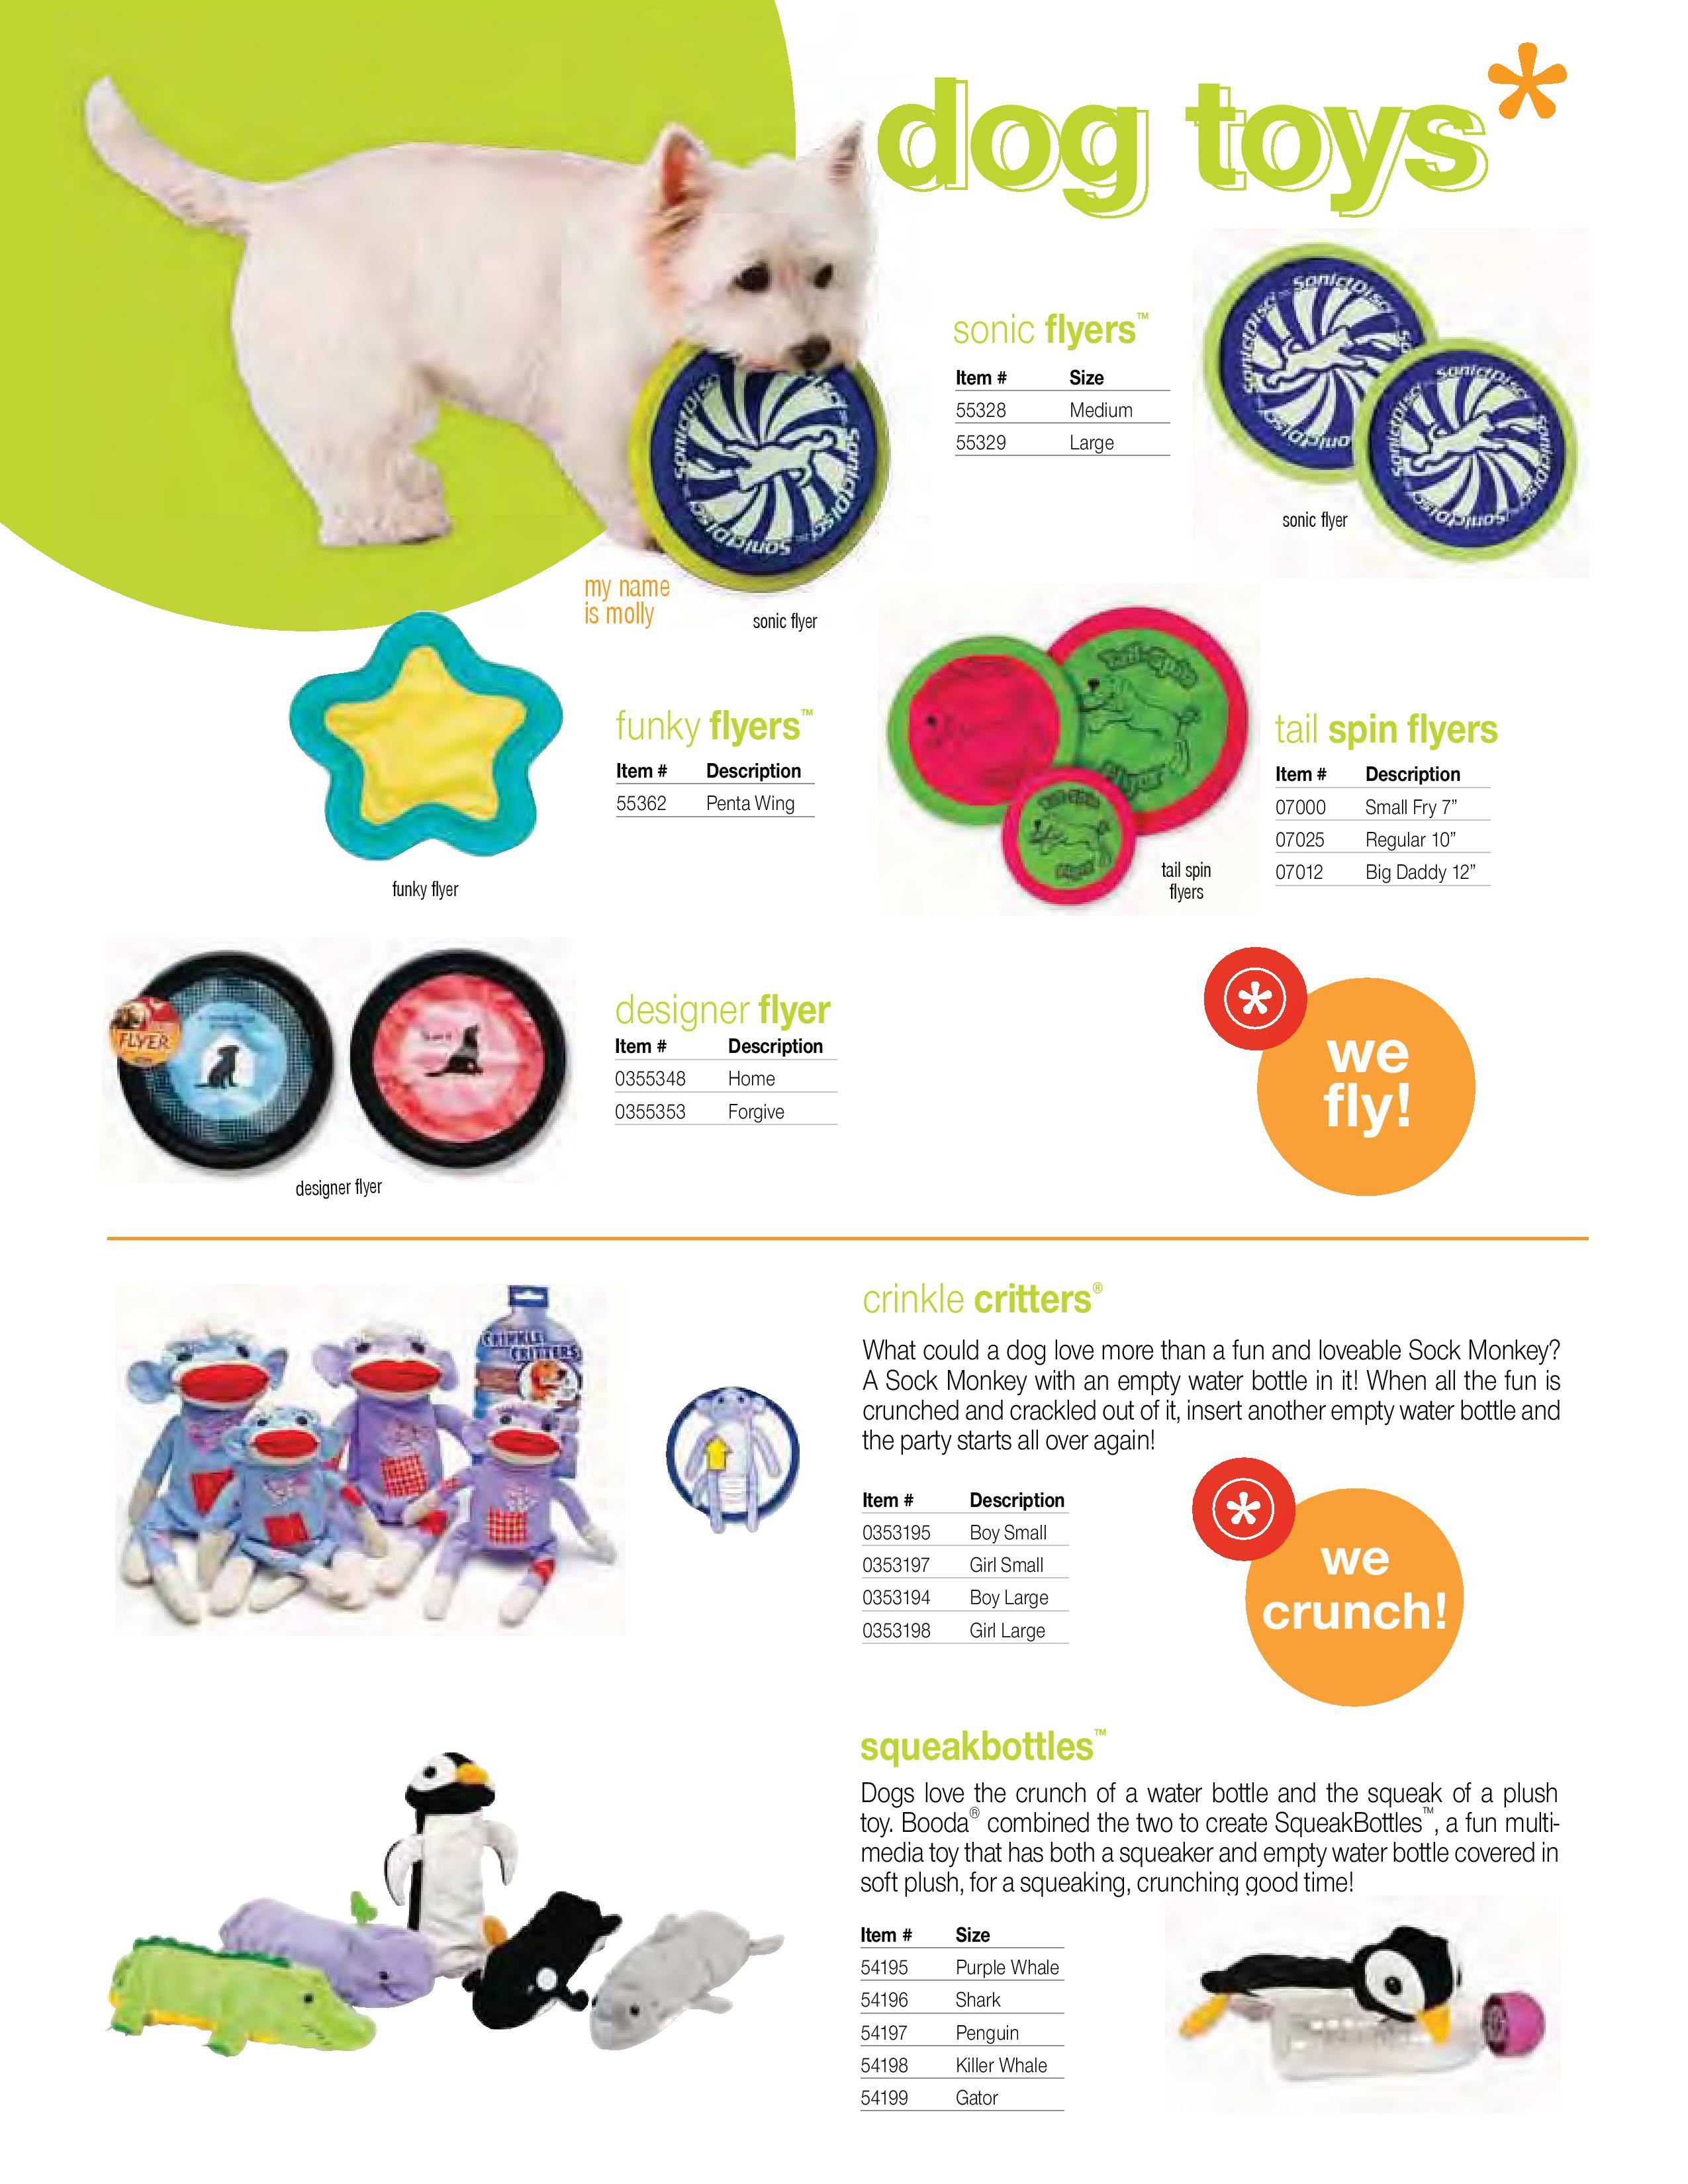 Emirtaes Animals Export 1 (40)